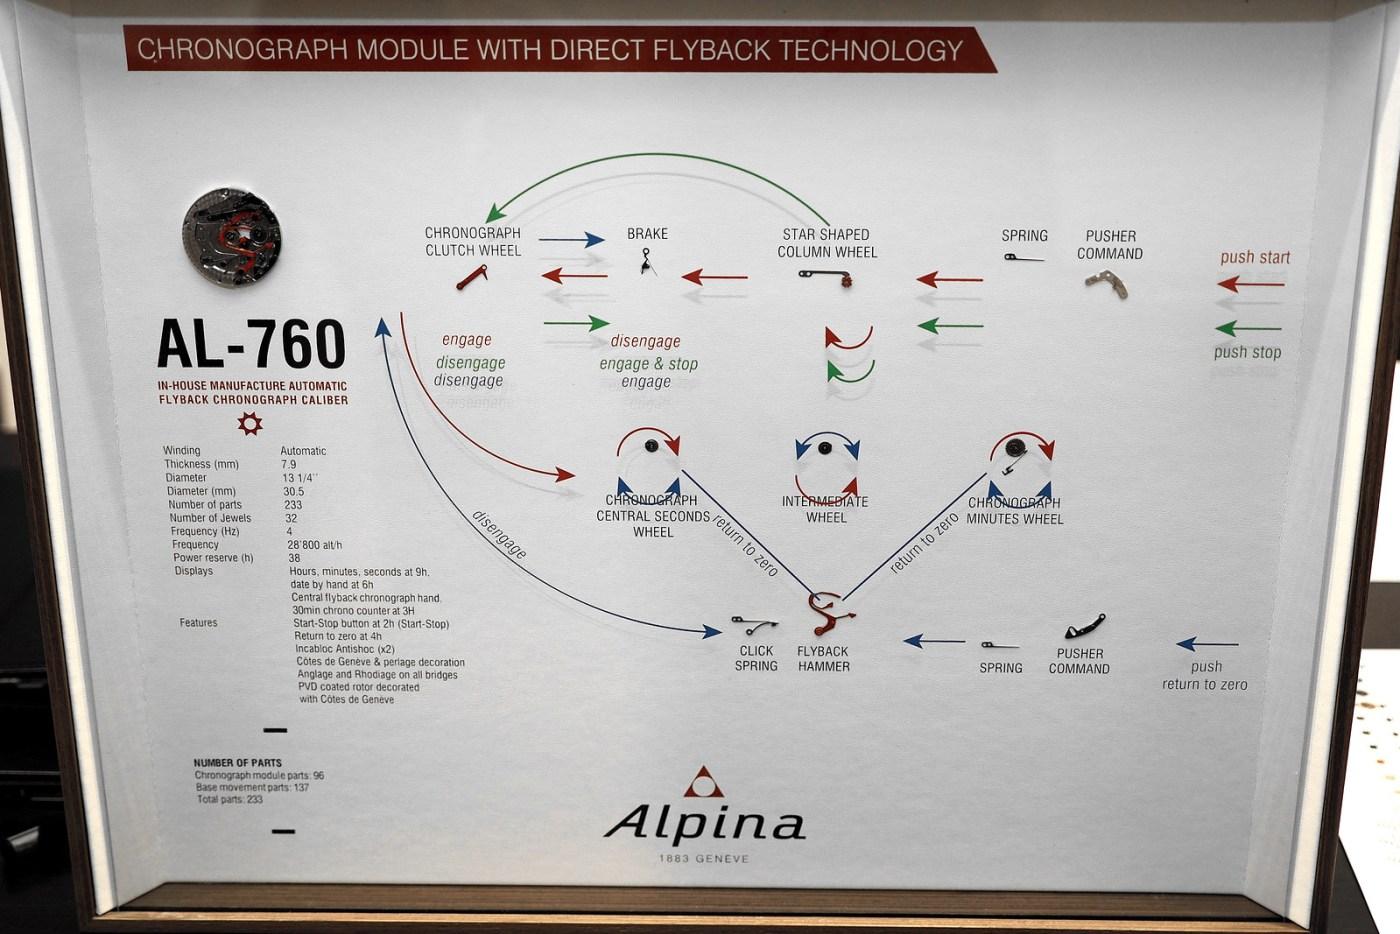 Alpina AL-760 chrongraph caliber diagram